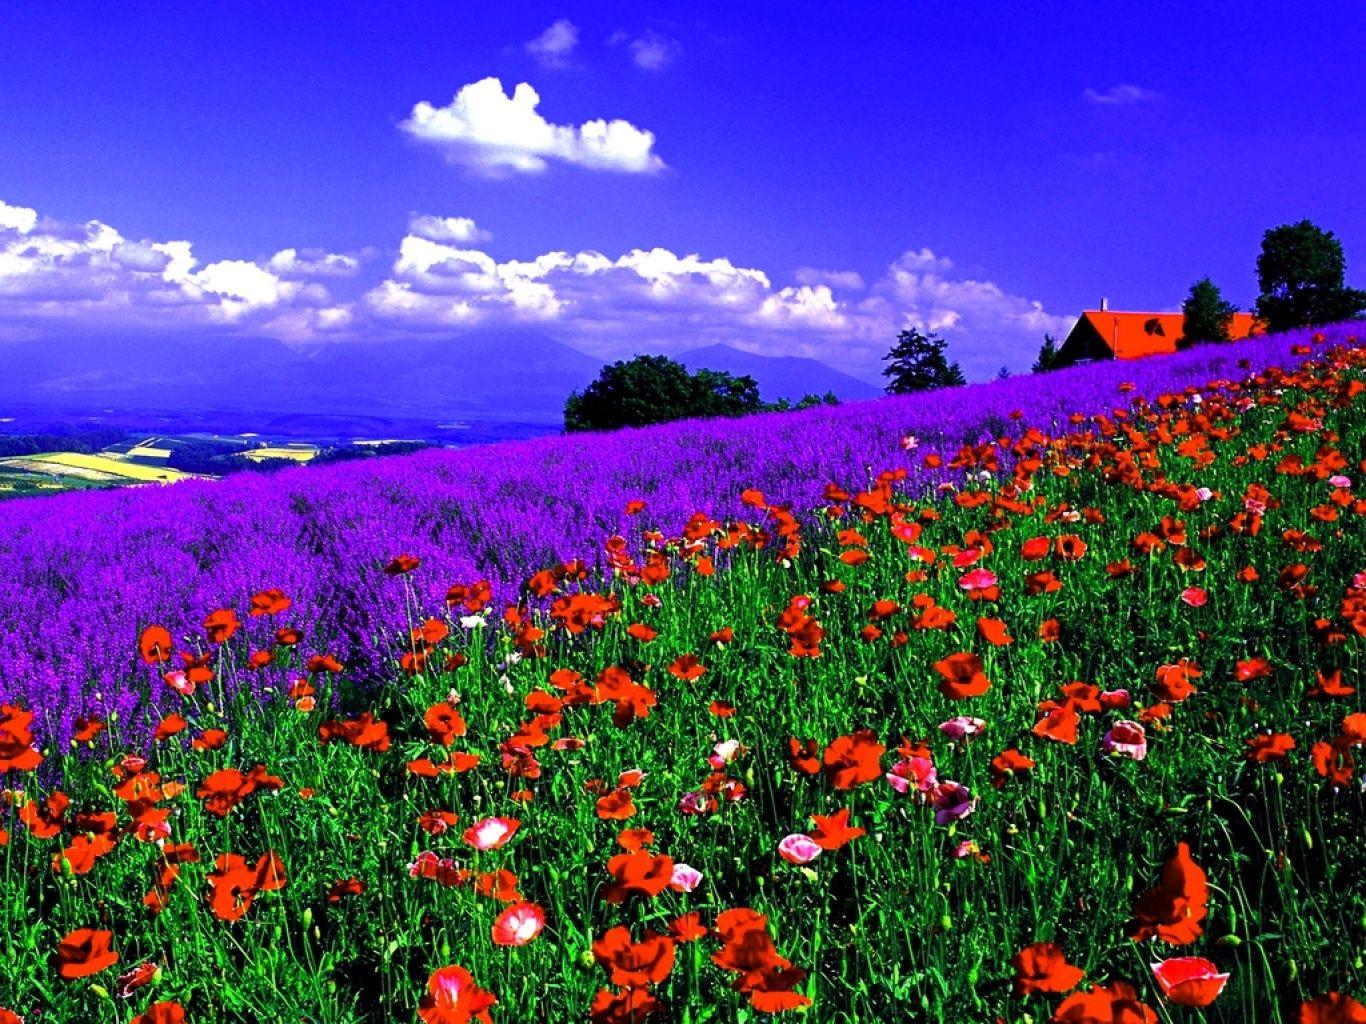 fondos de pantalla de flores de primavera